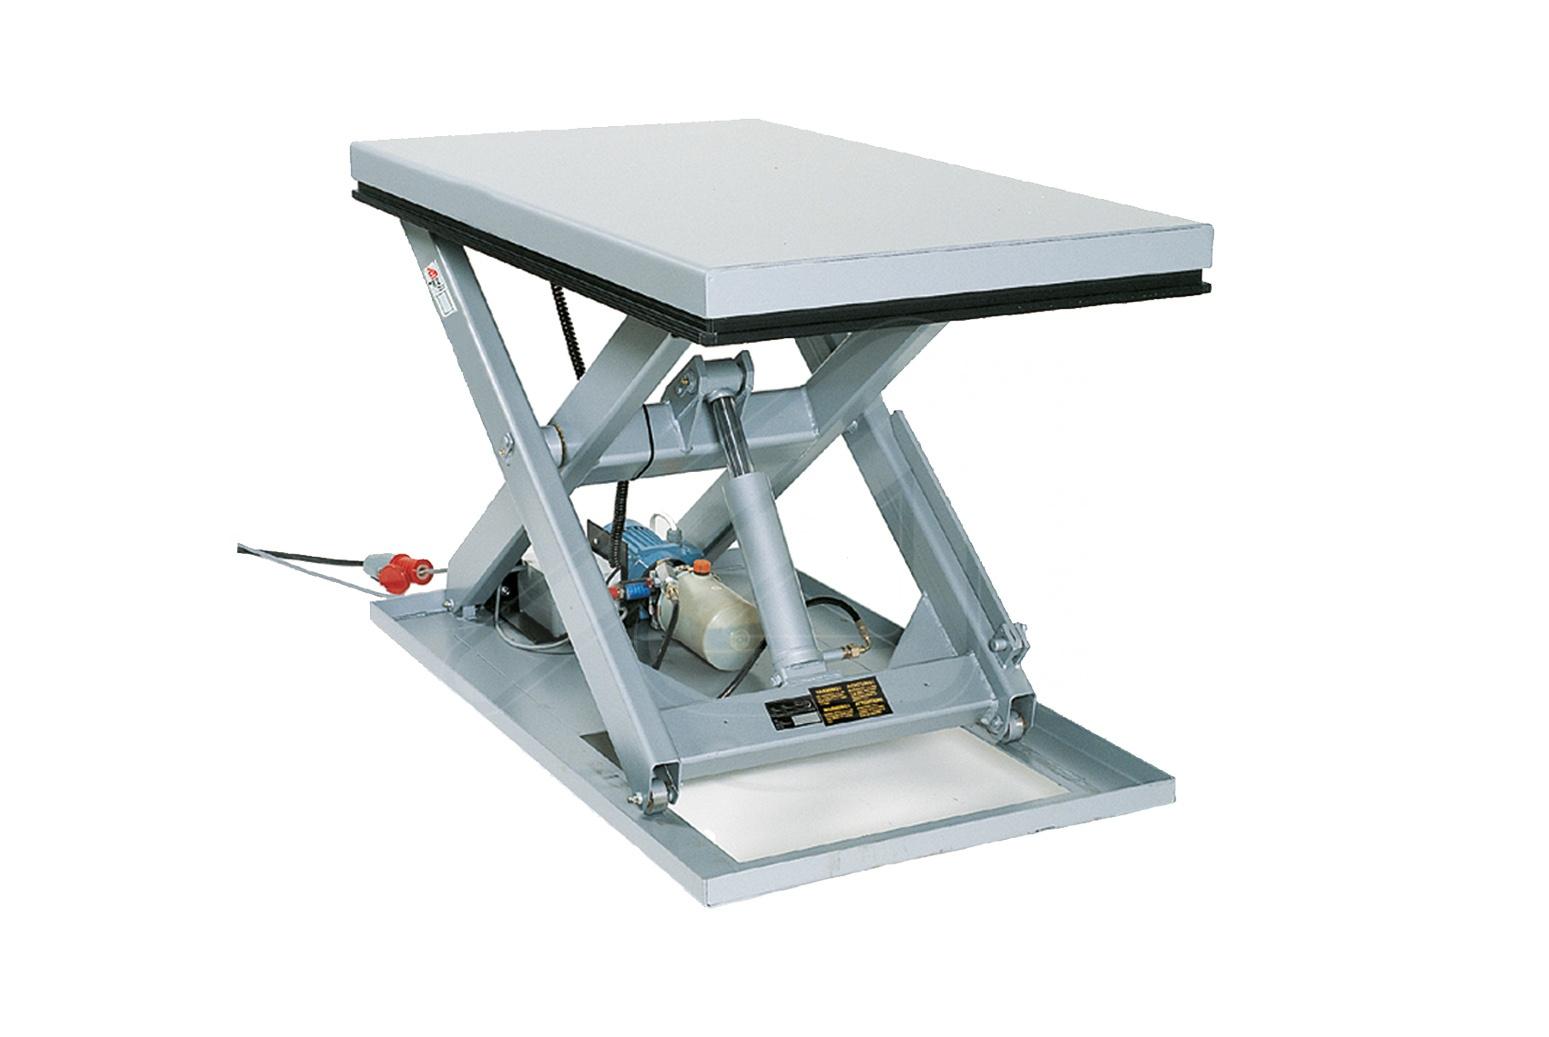 Simple scissors lifting tables